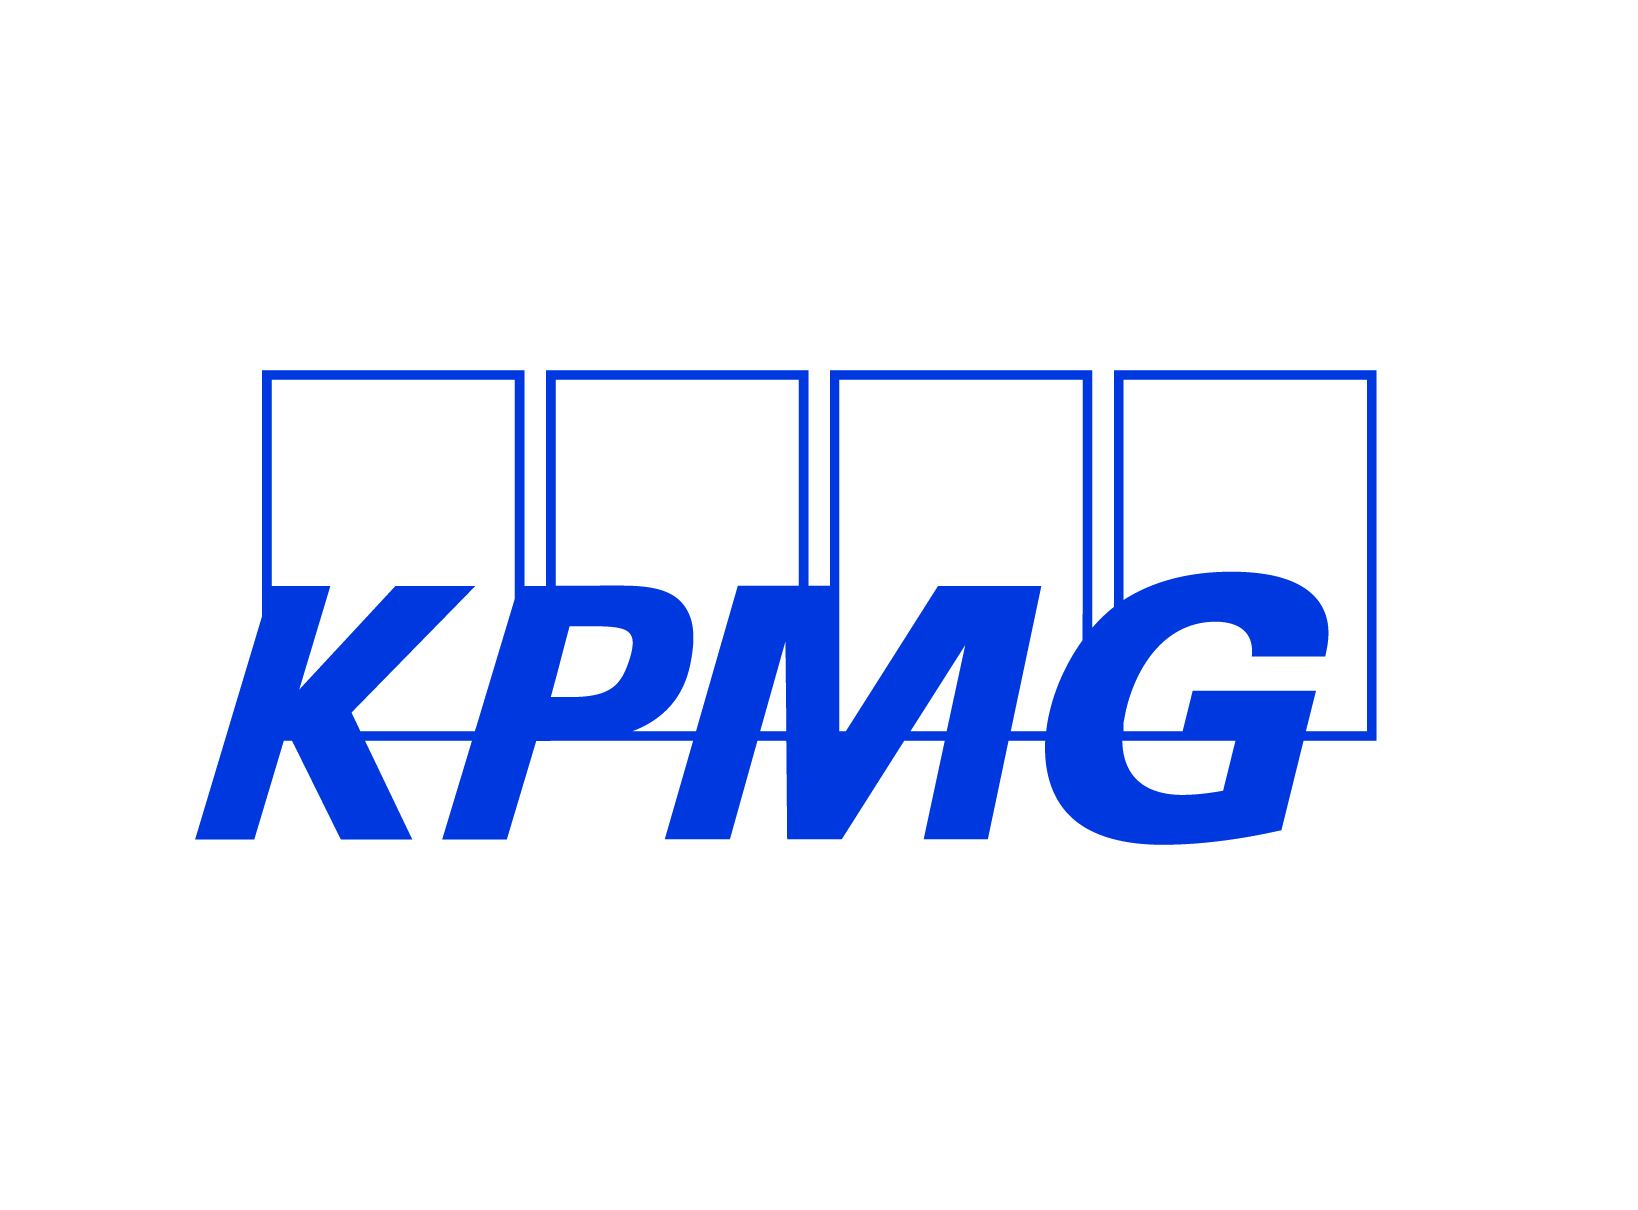 KPMG – January 2020